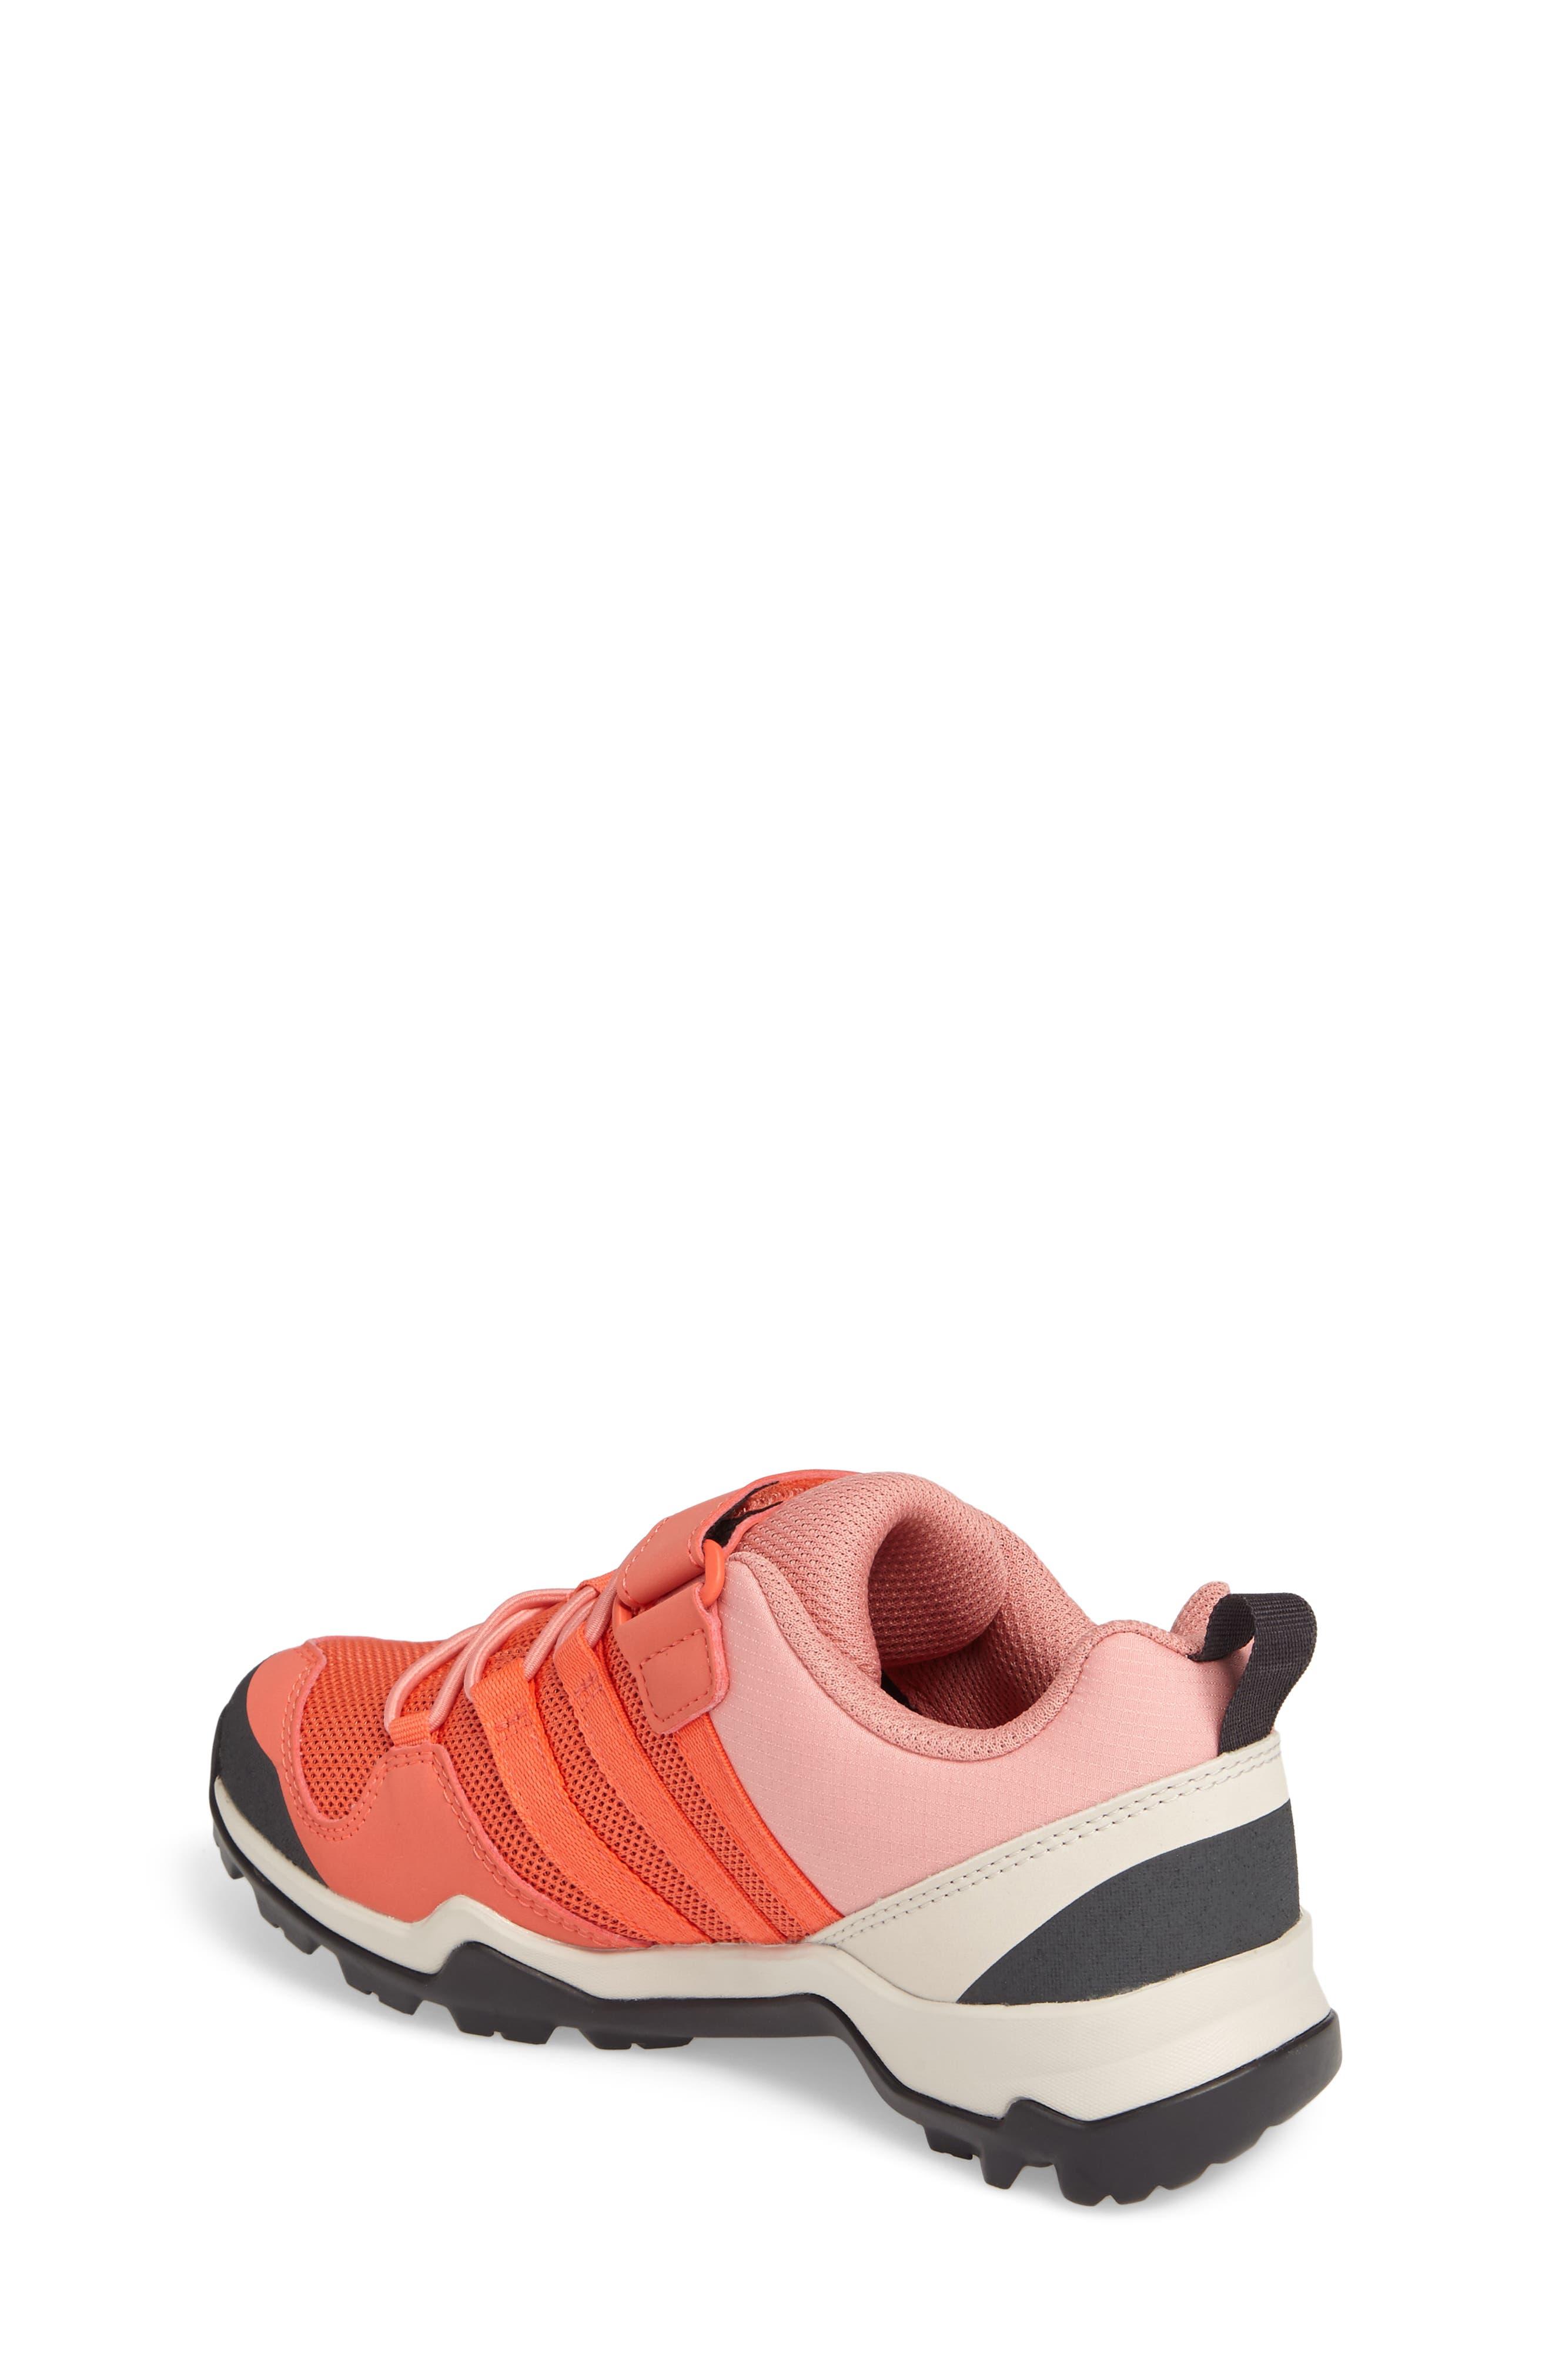 Terrex AX2R Sneaker,                             Alternate thumbnail 2, color,                             Easy Coral/ Tactile Rose